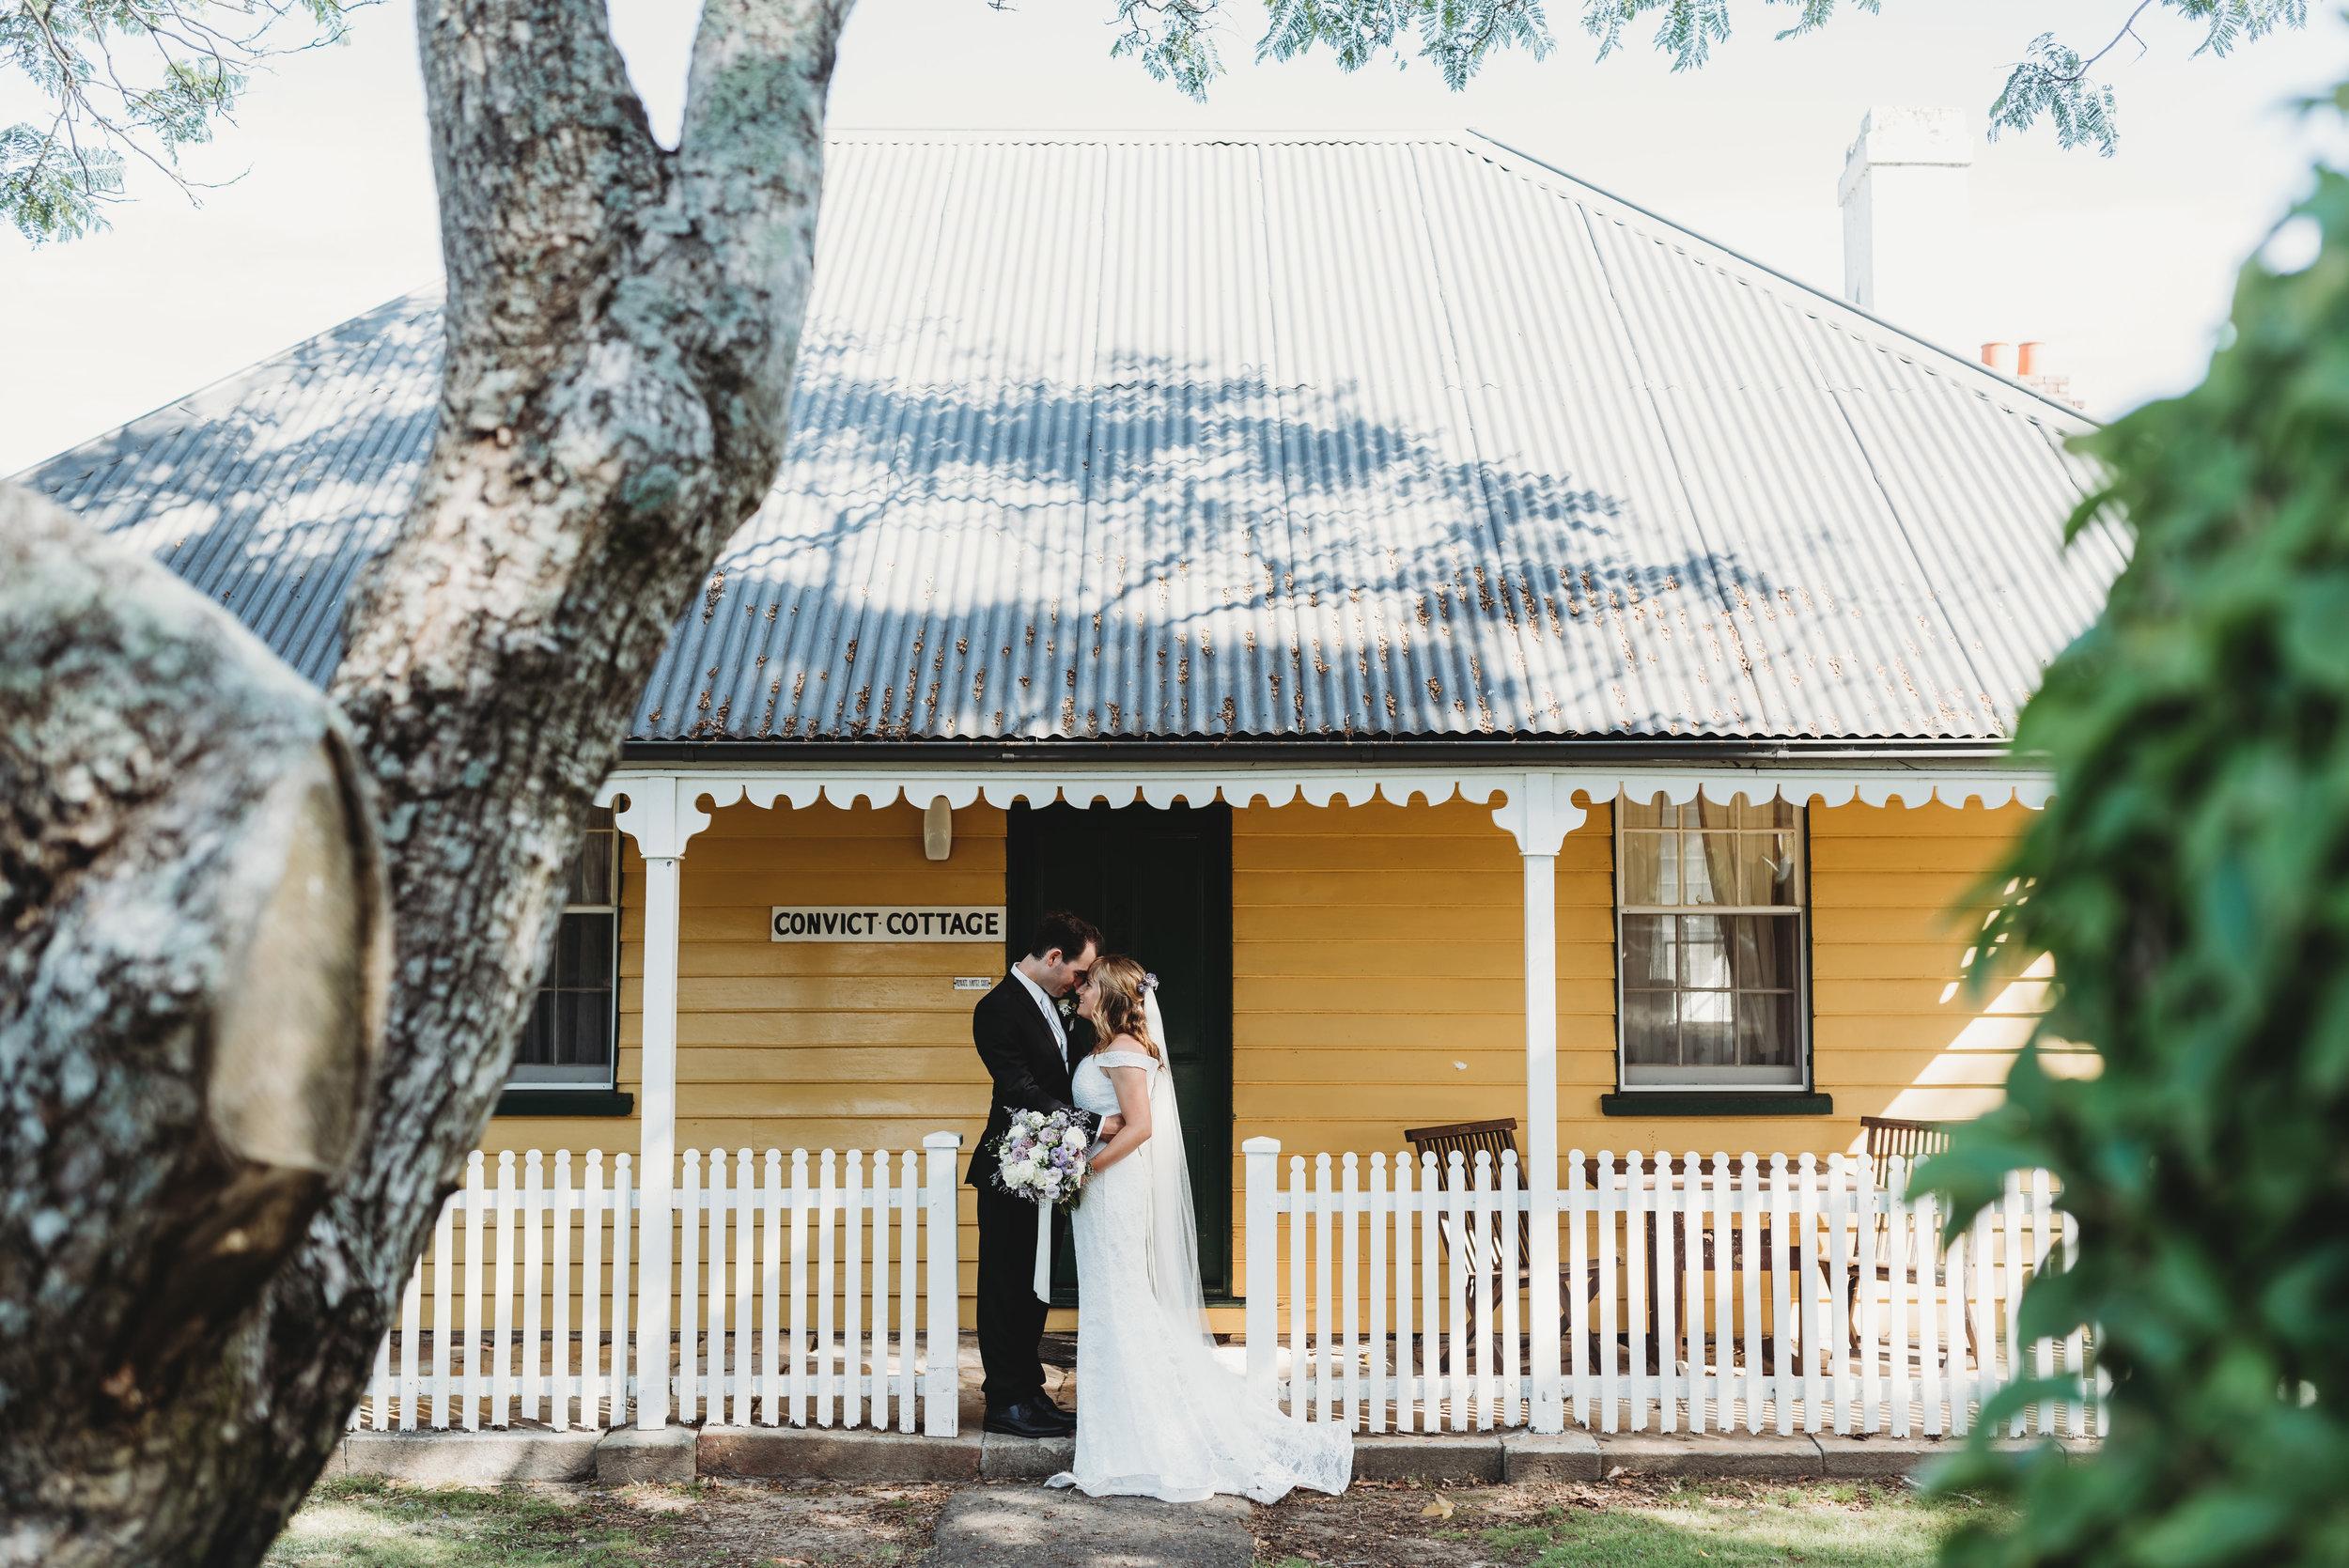 Emily & Matt - Coolangatta Estate Winery Wedding    29th December 2018